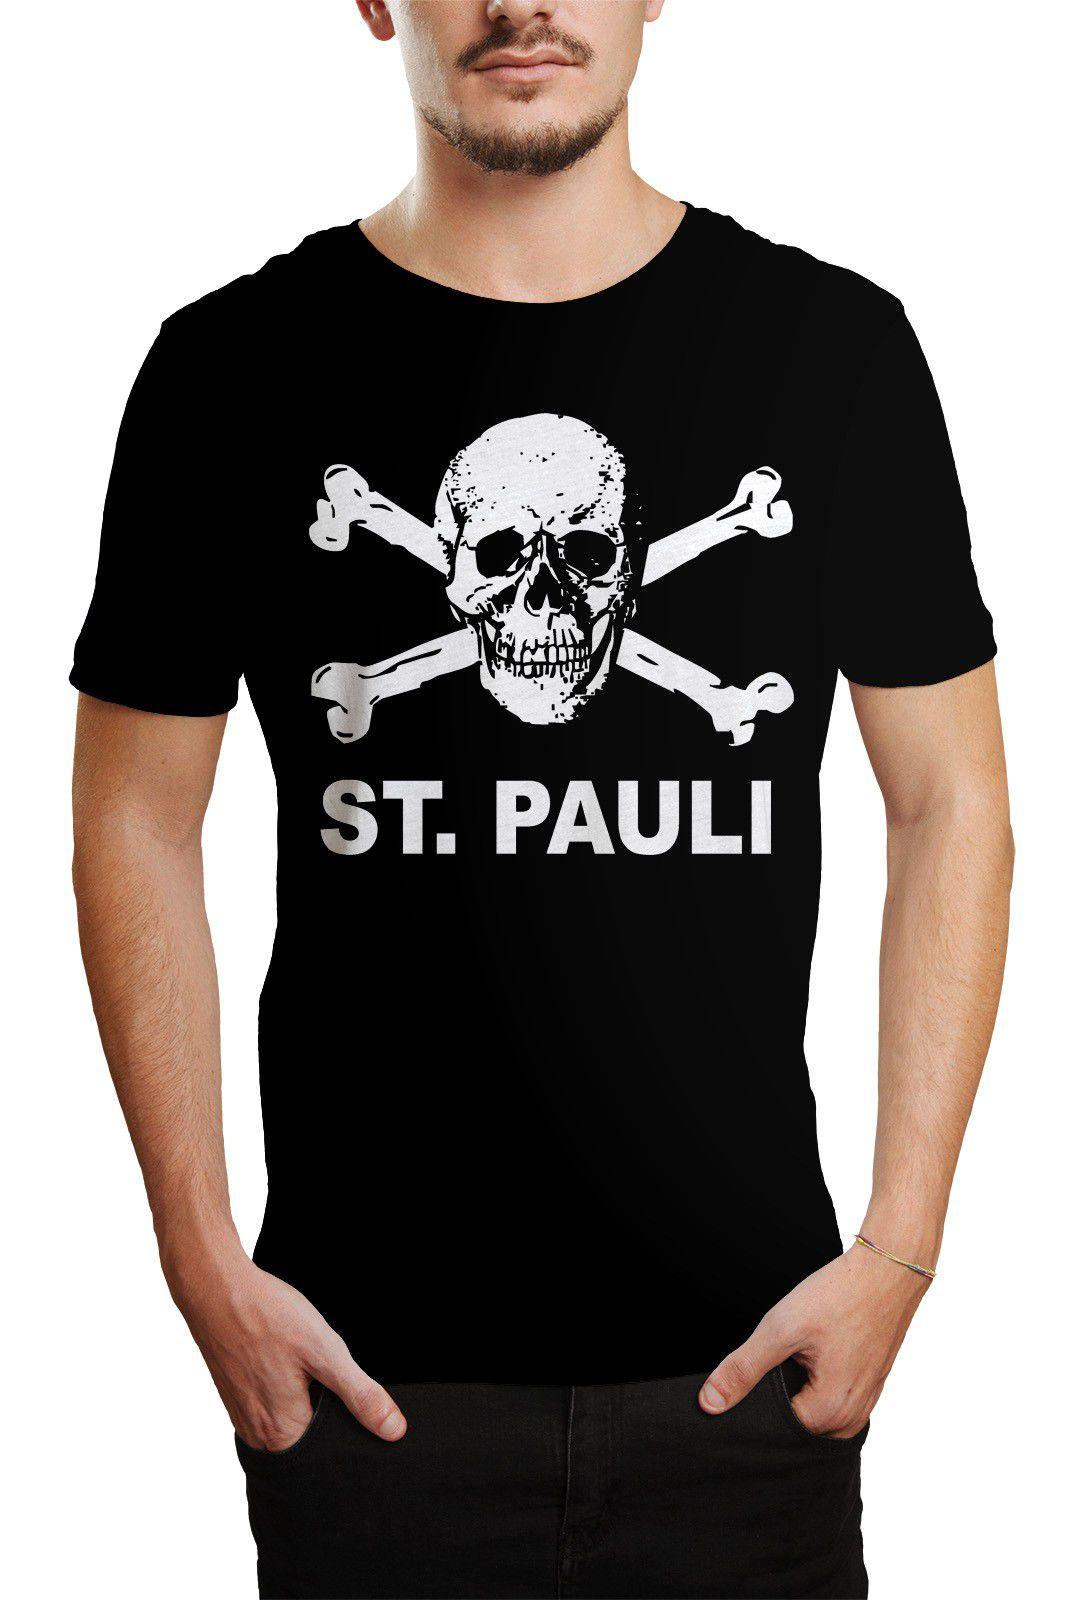 Camiseta HShop St Pauli - Escolha a Cor  - HShop